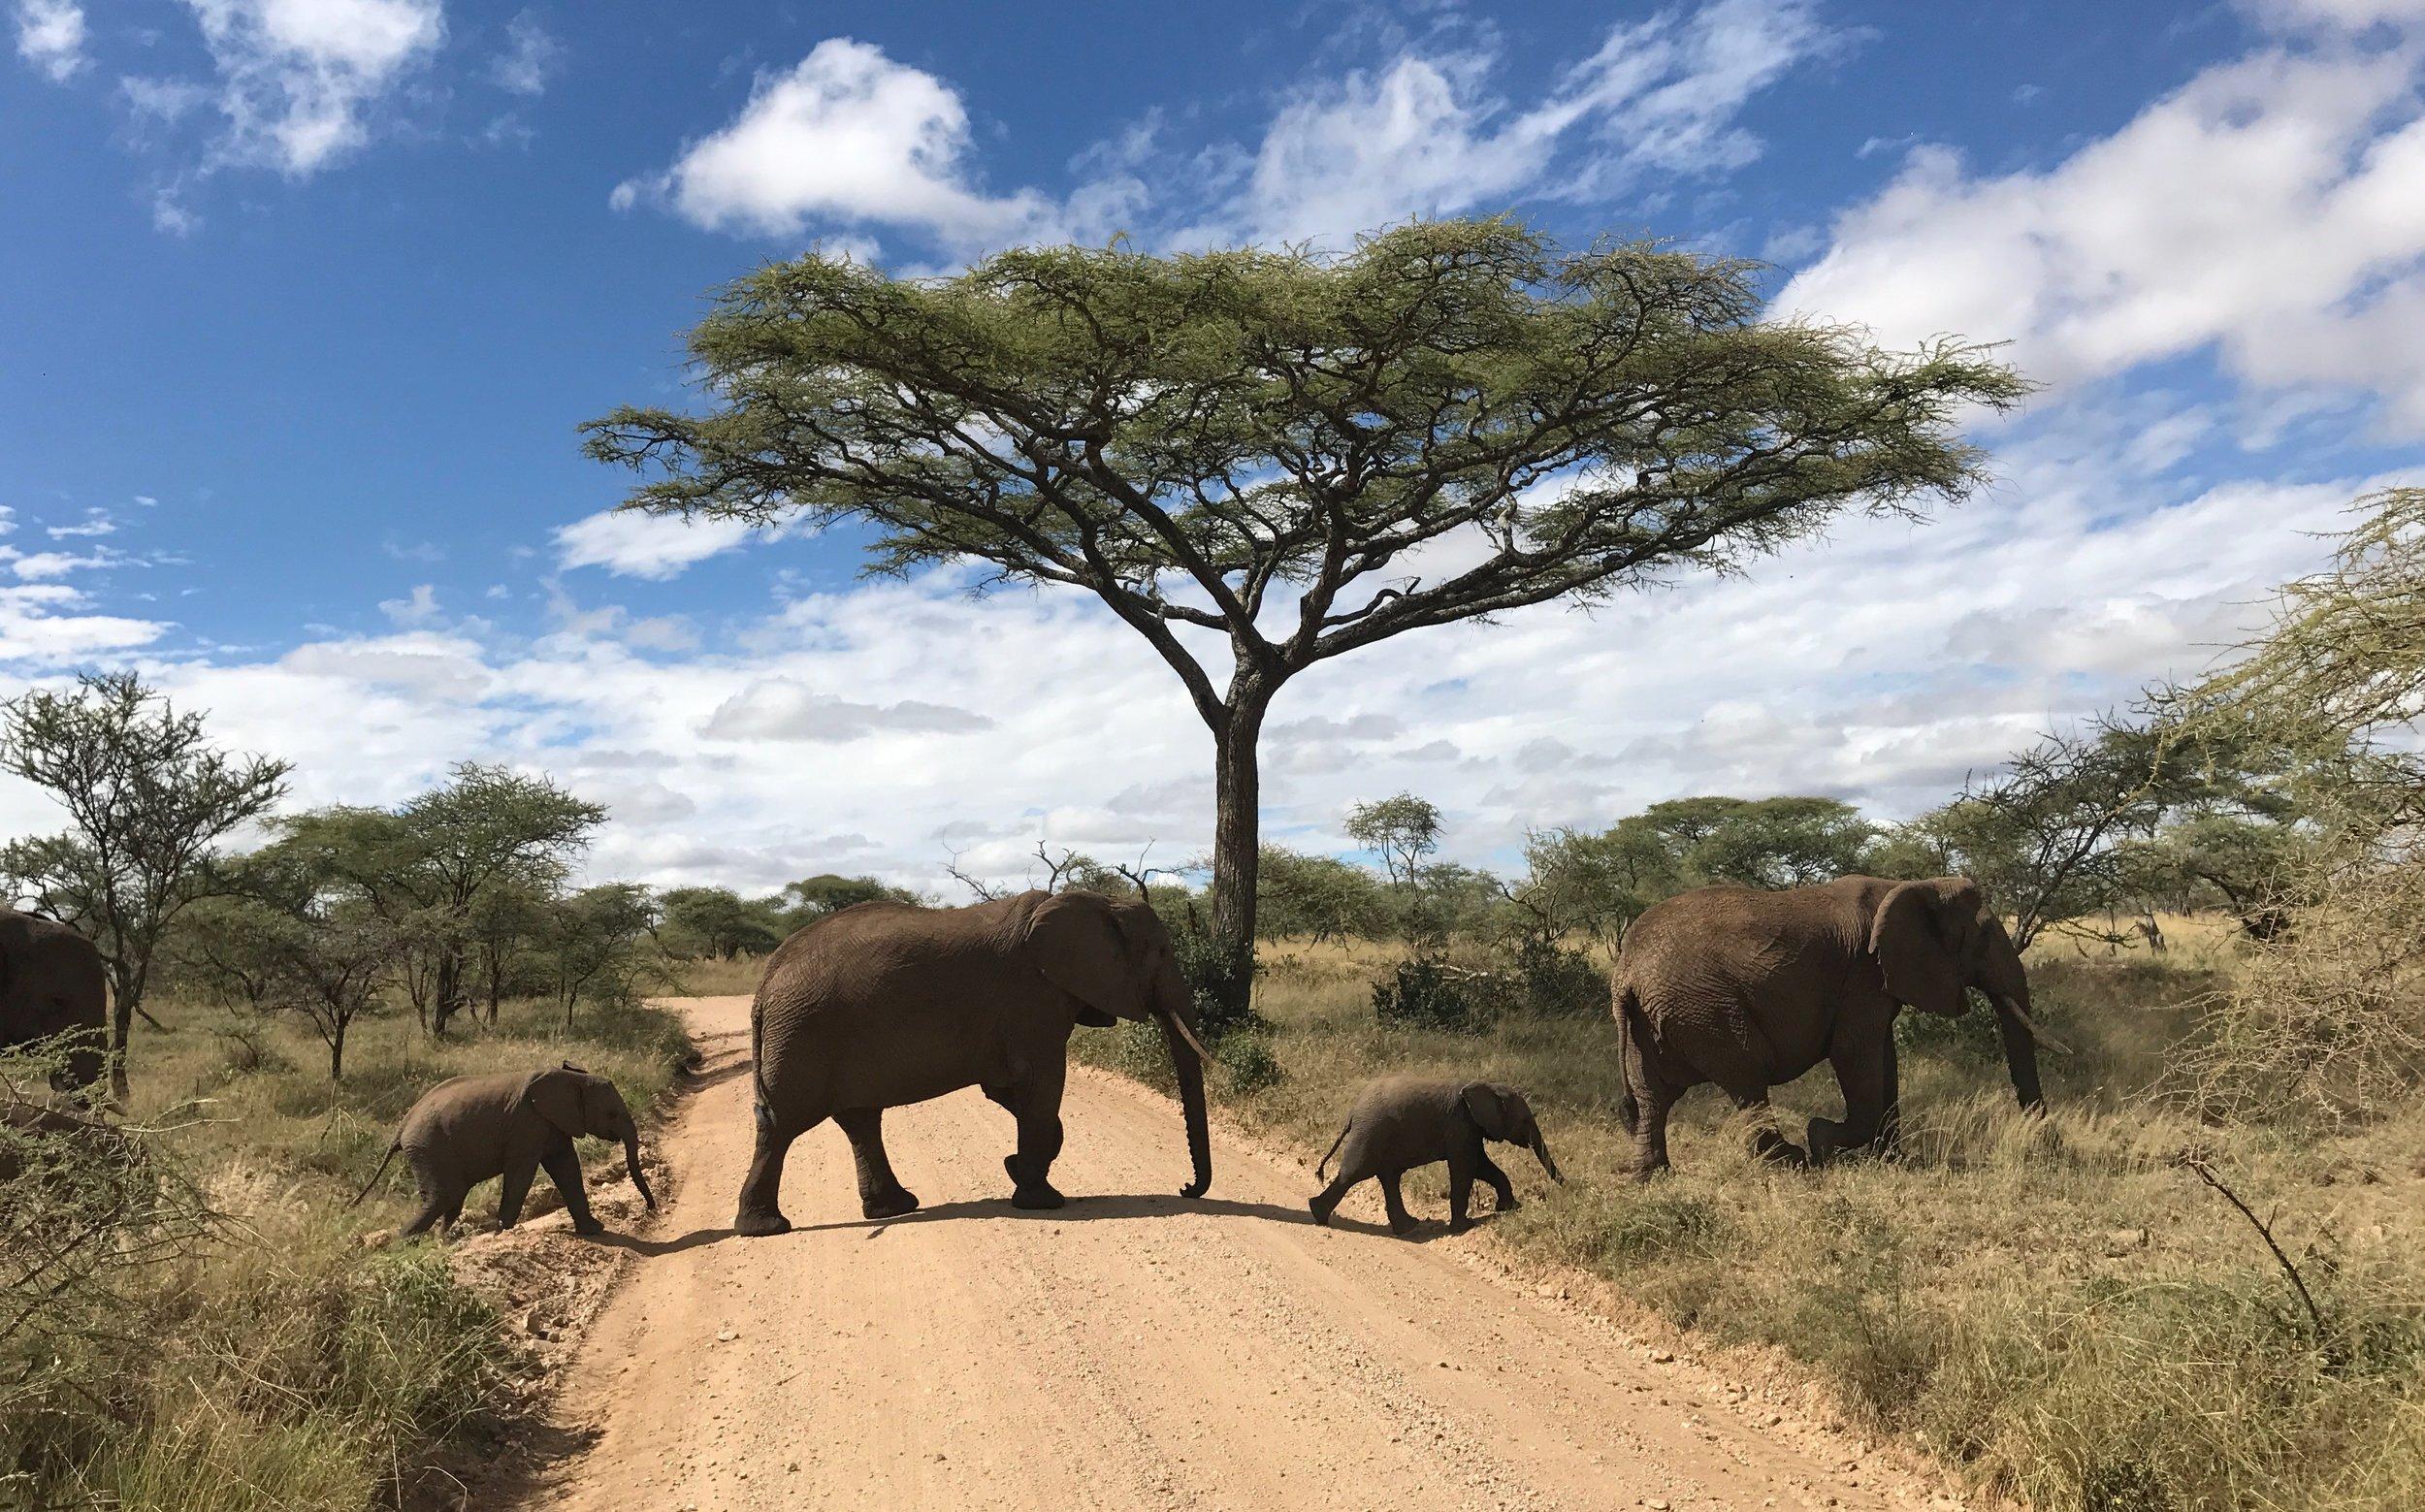 Tanzania. Image from Jessica Nabongo.